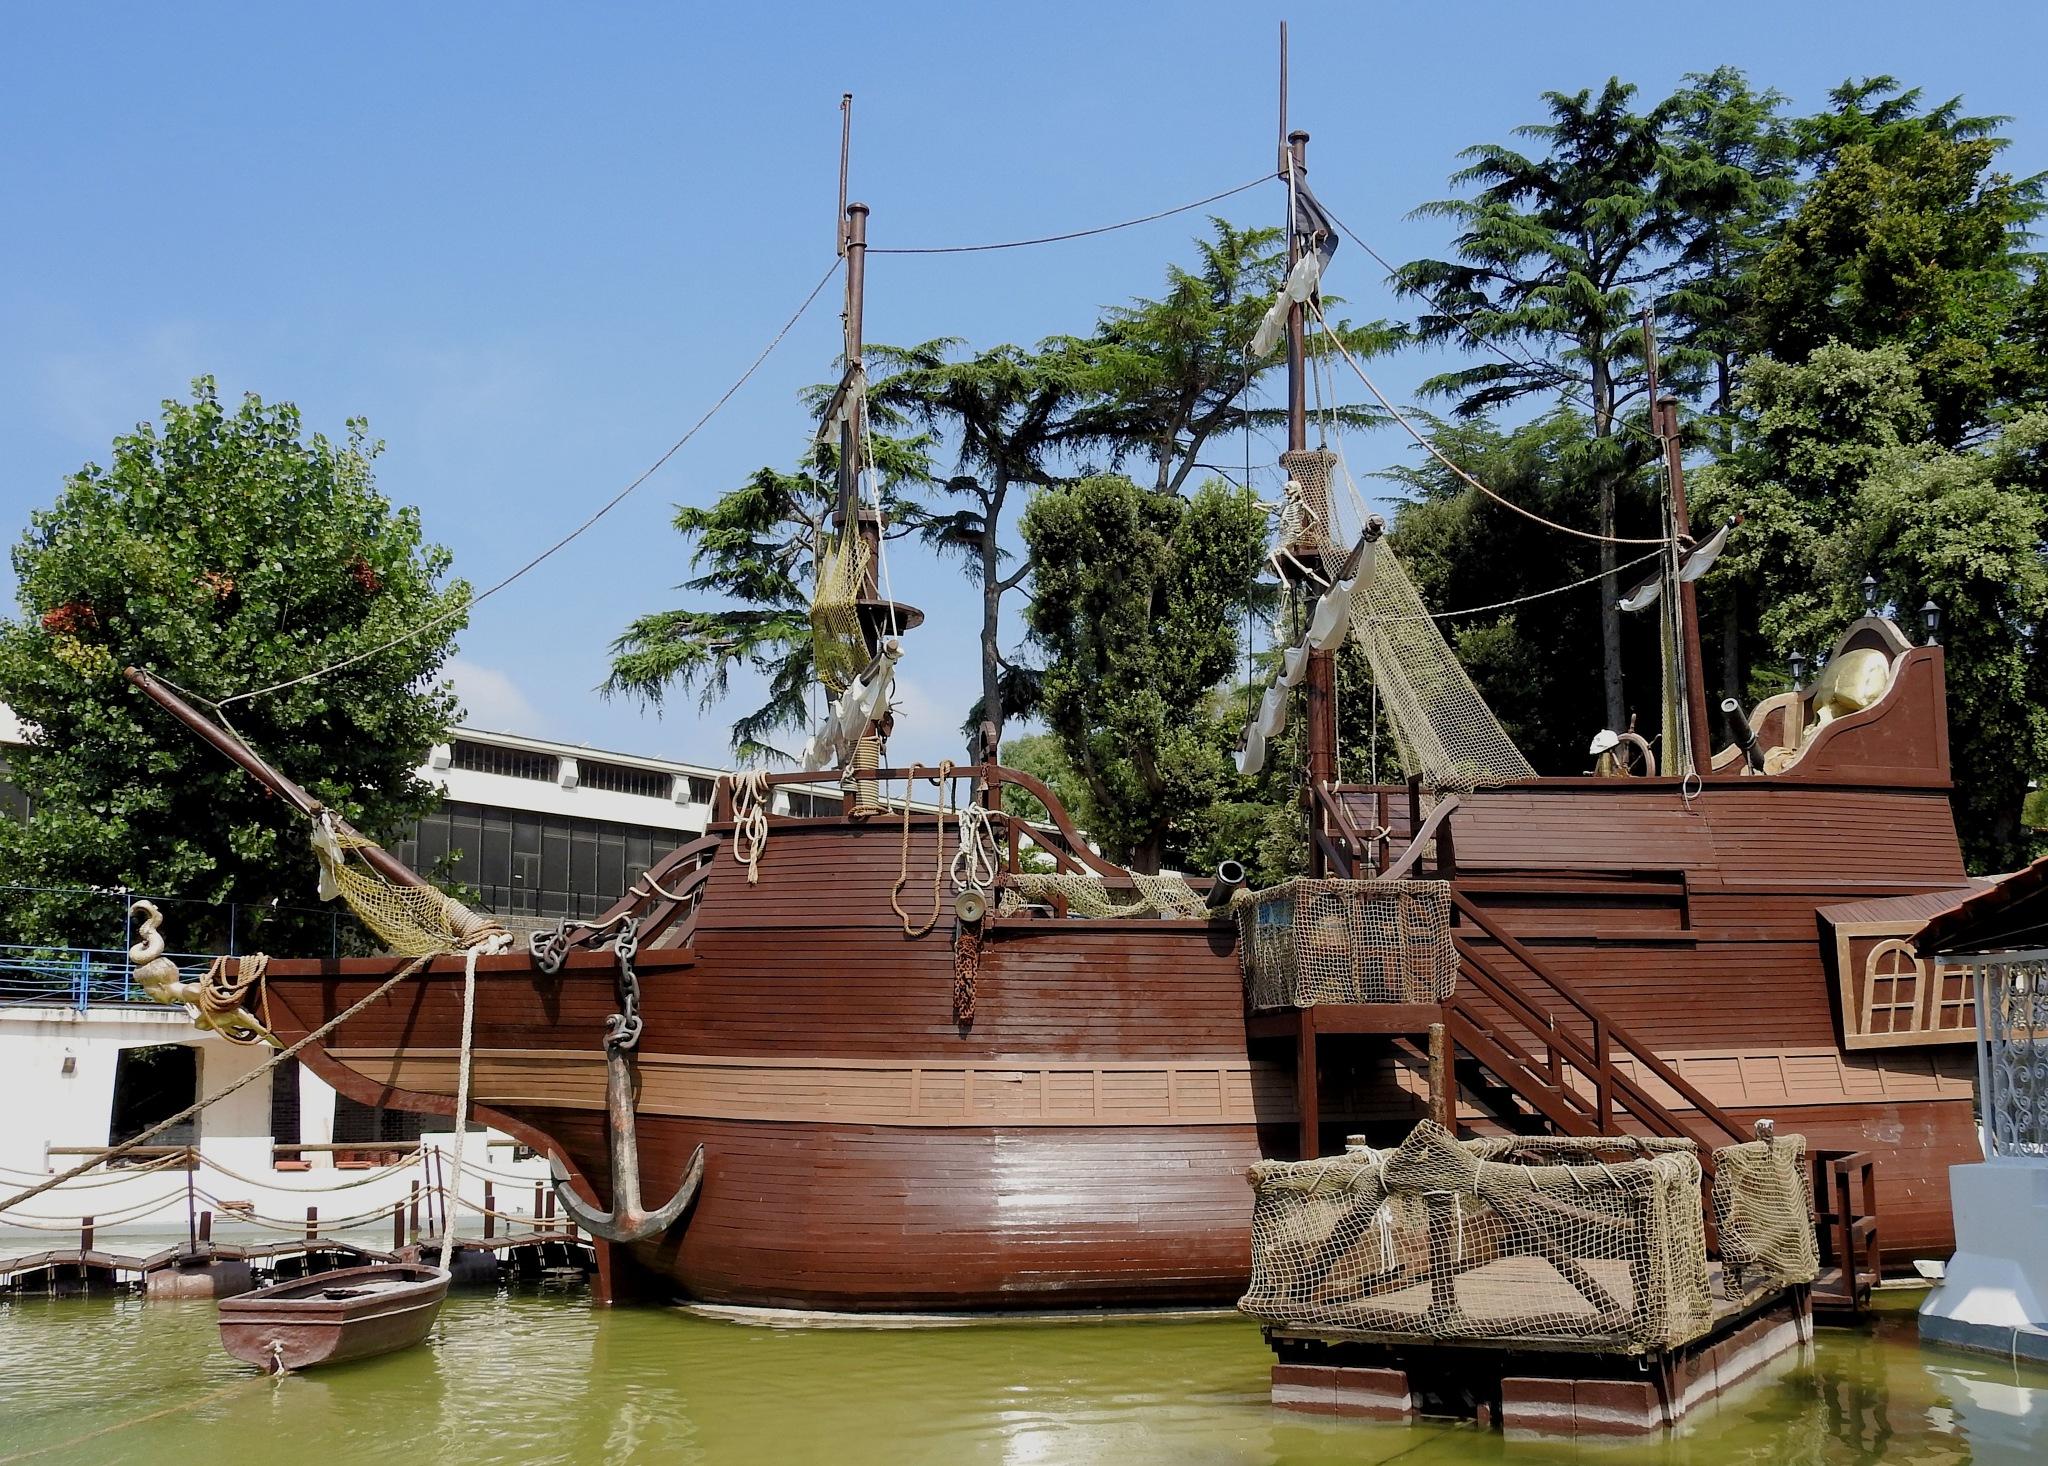 Naples - Edenlandia [Amusement Park] - The Pirates Vessel  by Arnaldo De Lisio